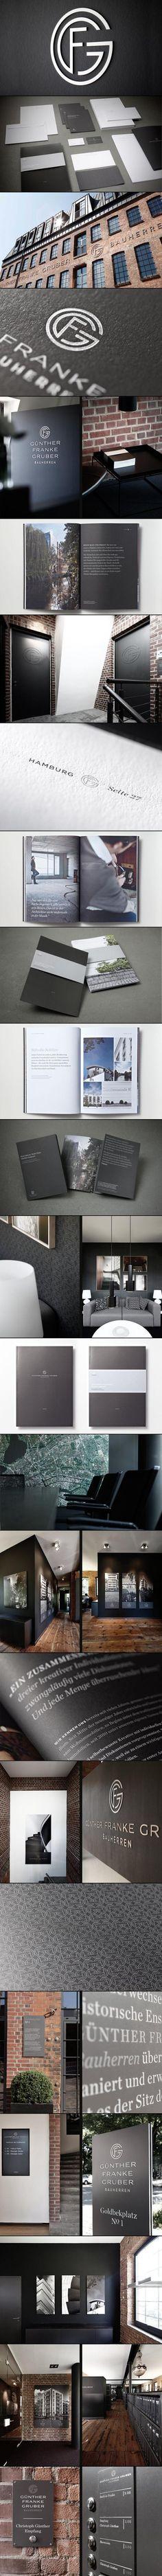 GFG Bauherren | #stationary #corporate #design #corporatedesign #identity #branding #marketing < repinned by www.BlickeDeeler.de | Take a look at www.LogoGestaltung-Hamburg.de